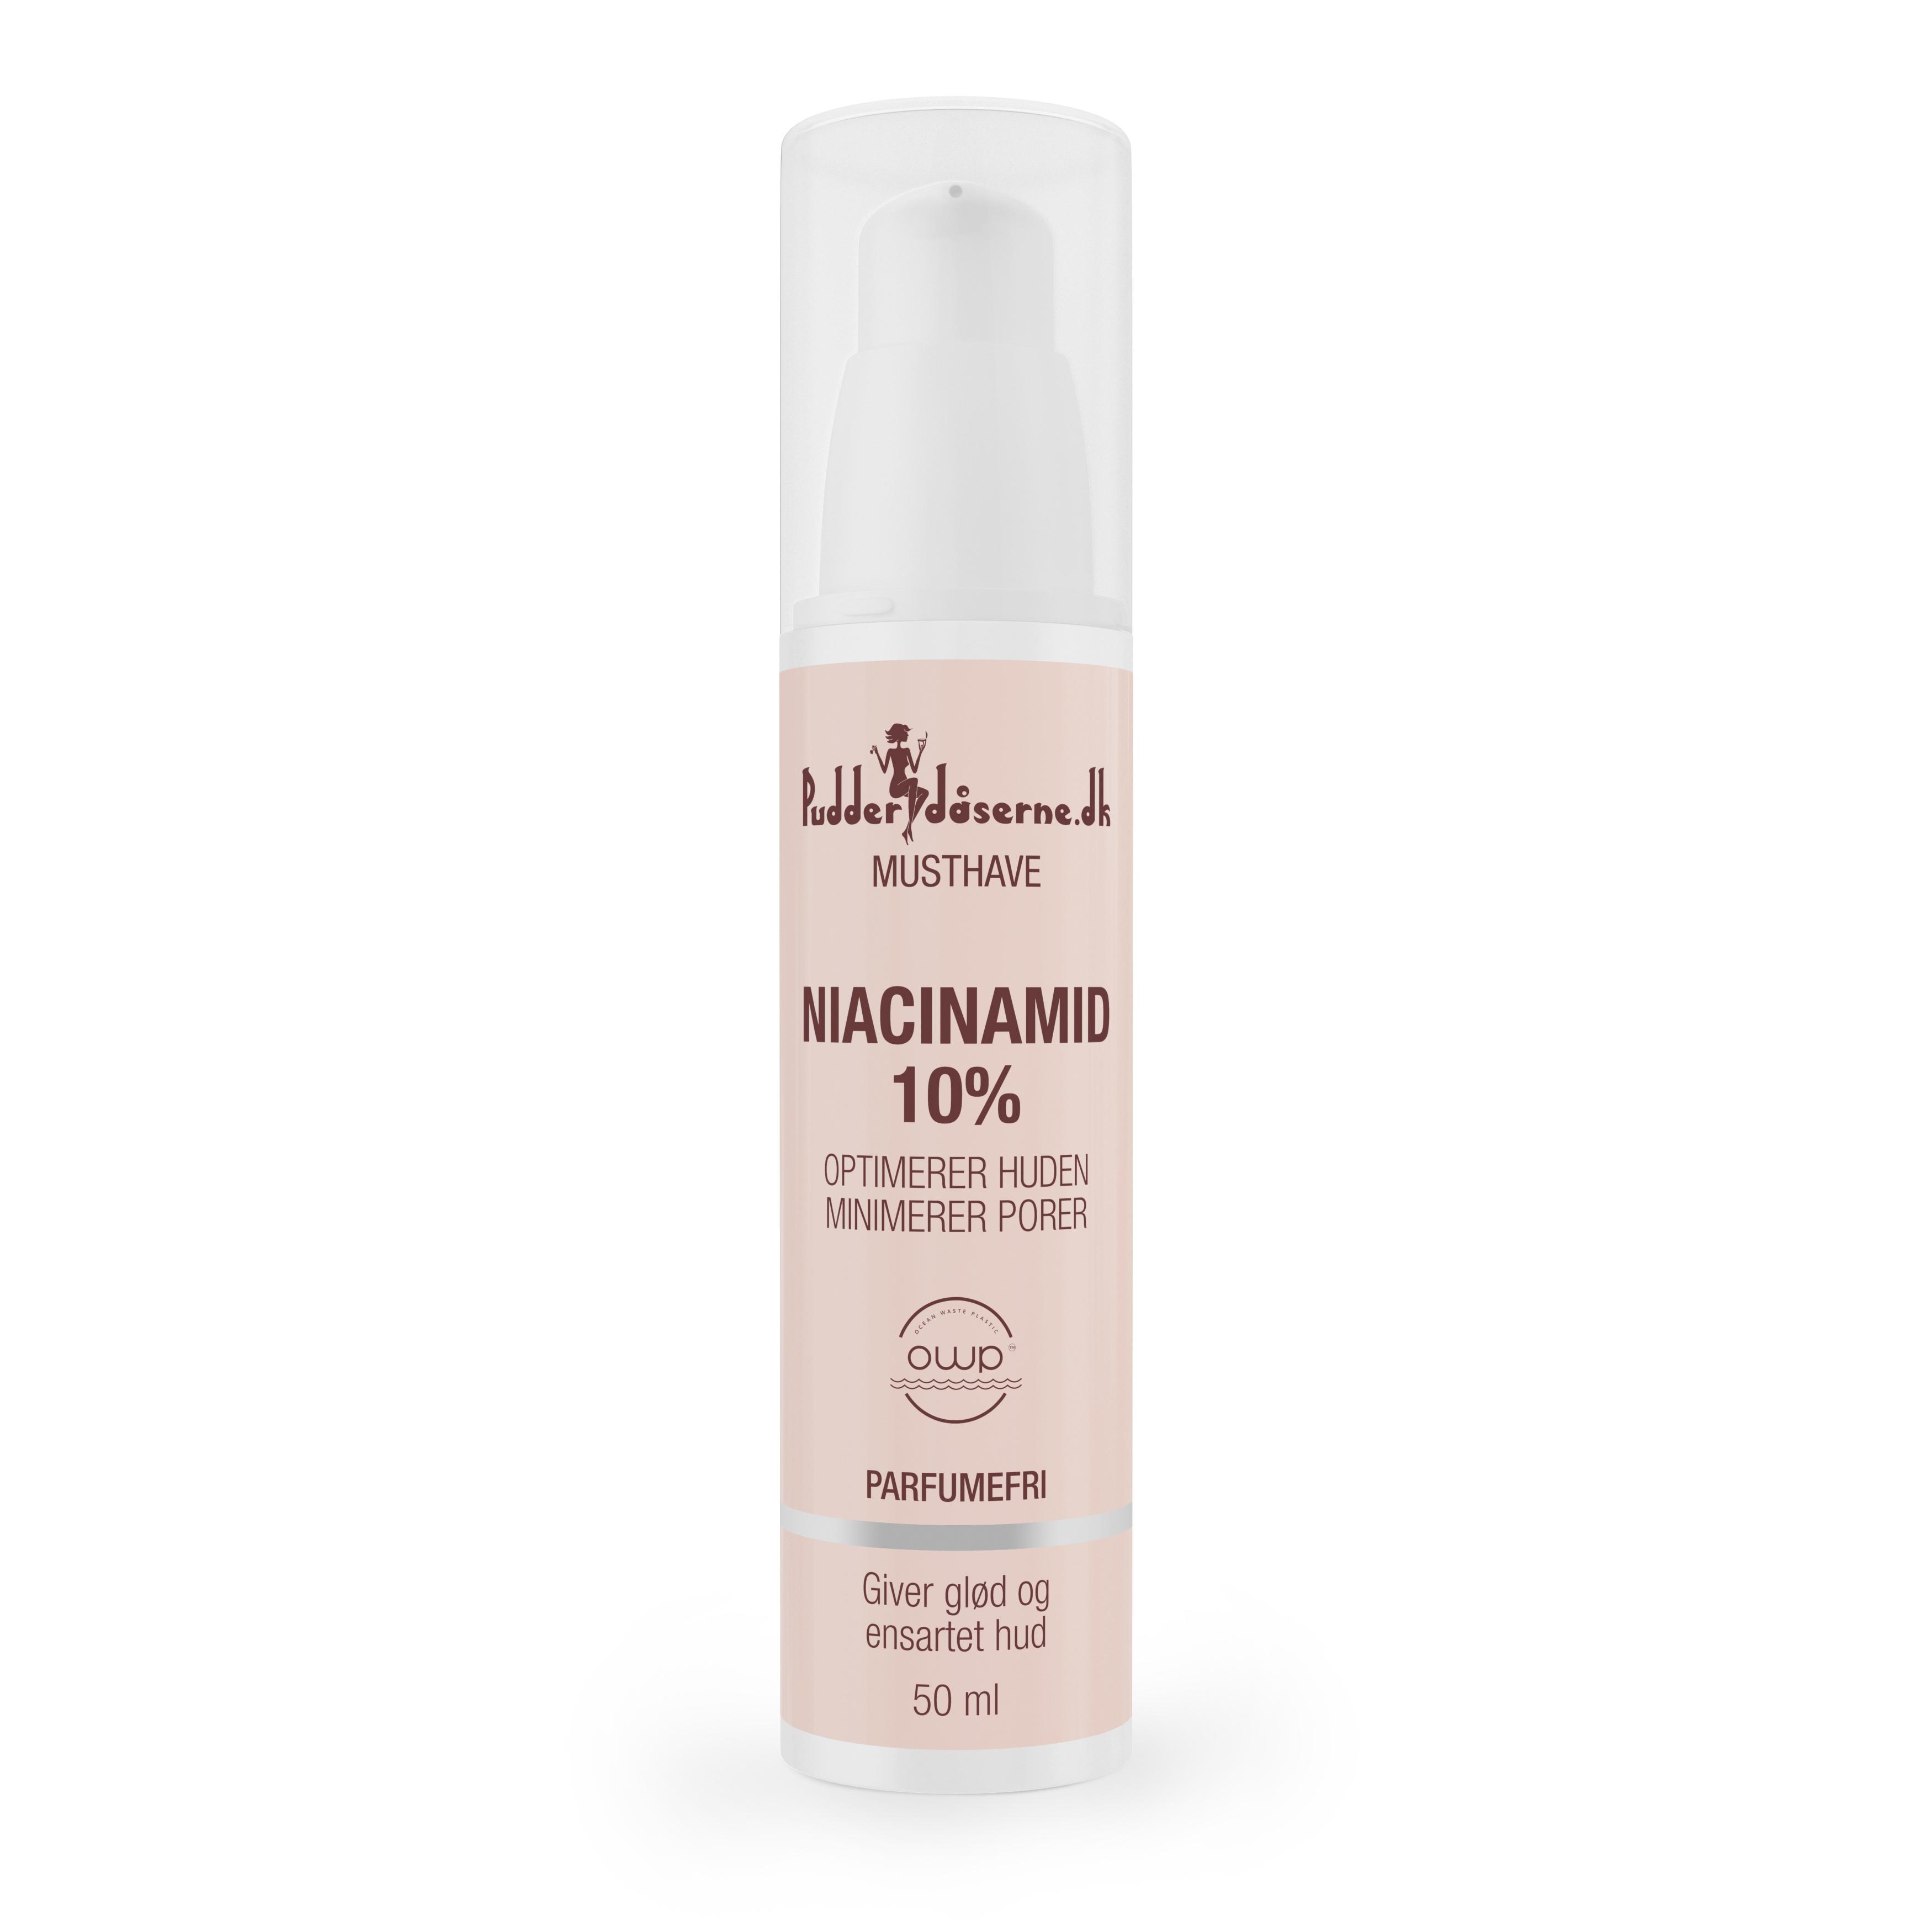 Pudderdåserne Niacinamid Serum, 50 ml